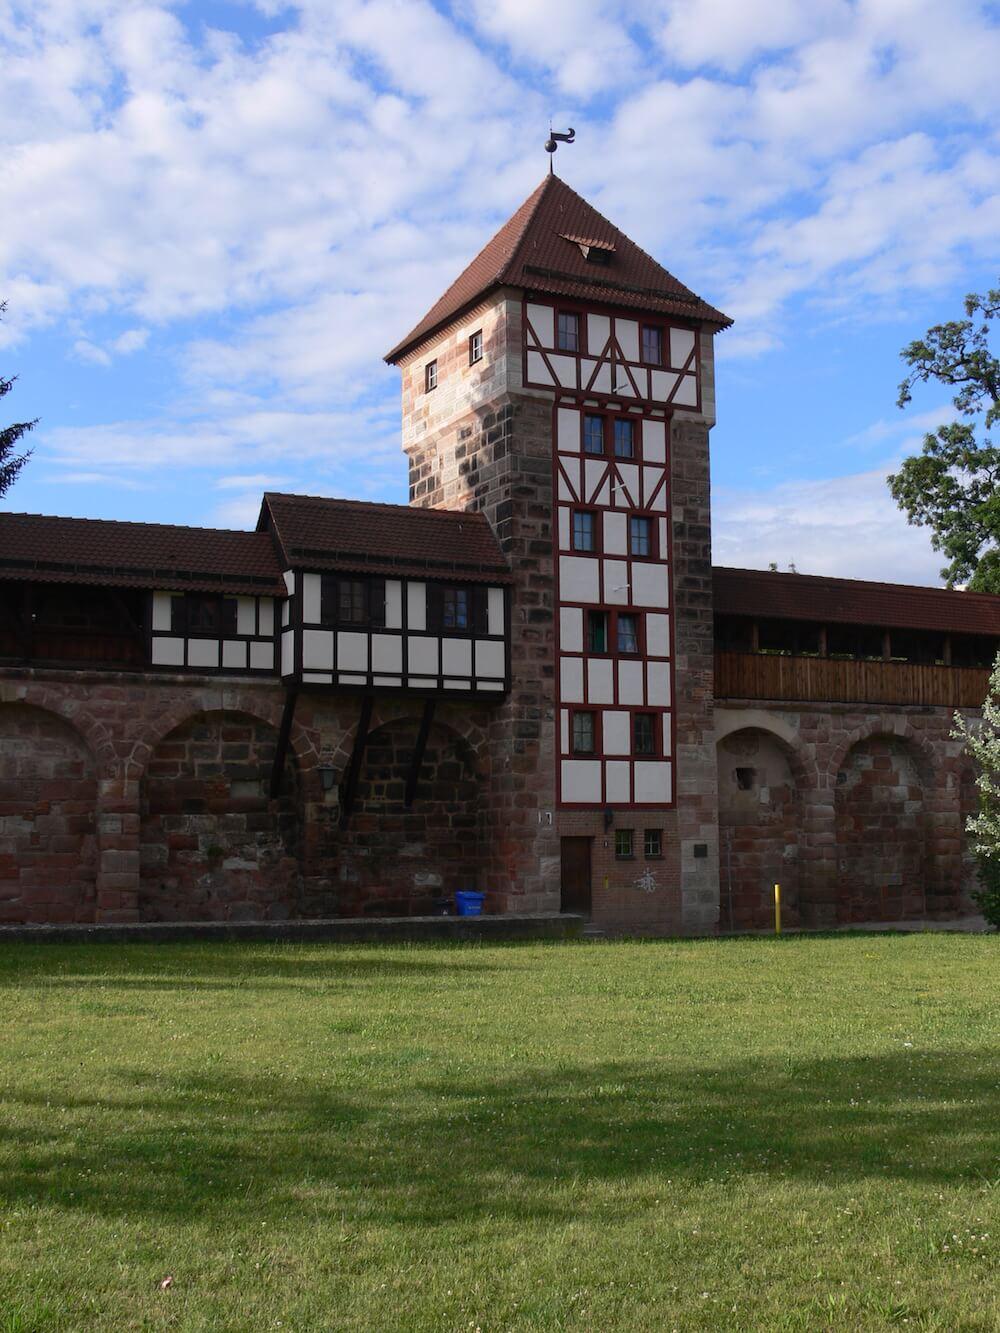 Stadt Mittelalter Turm